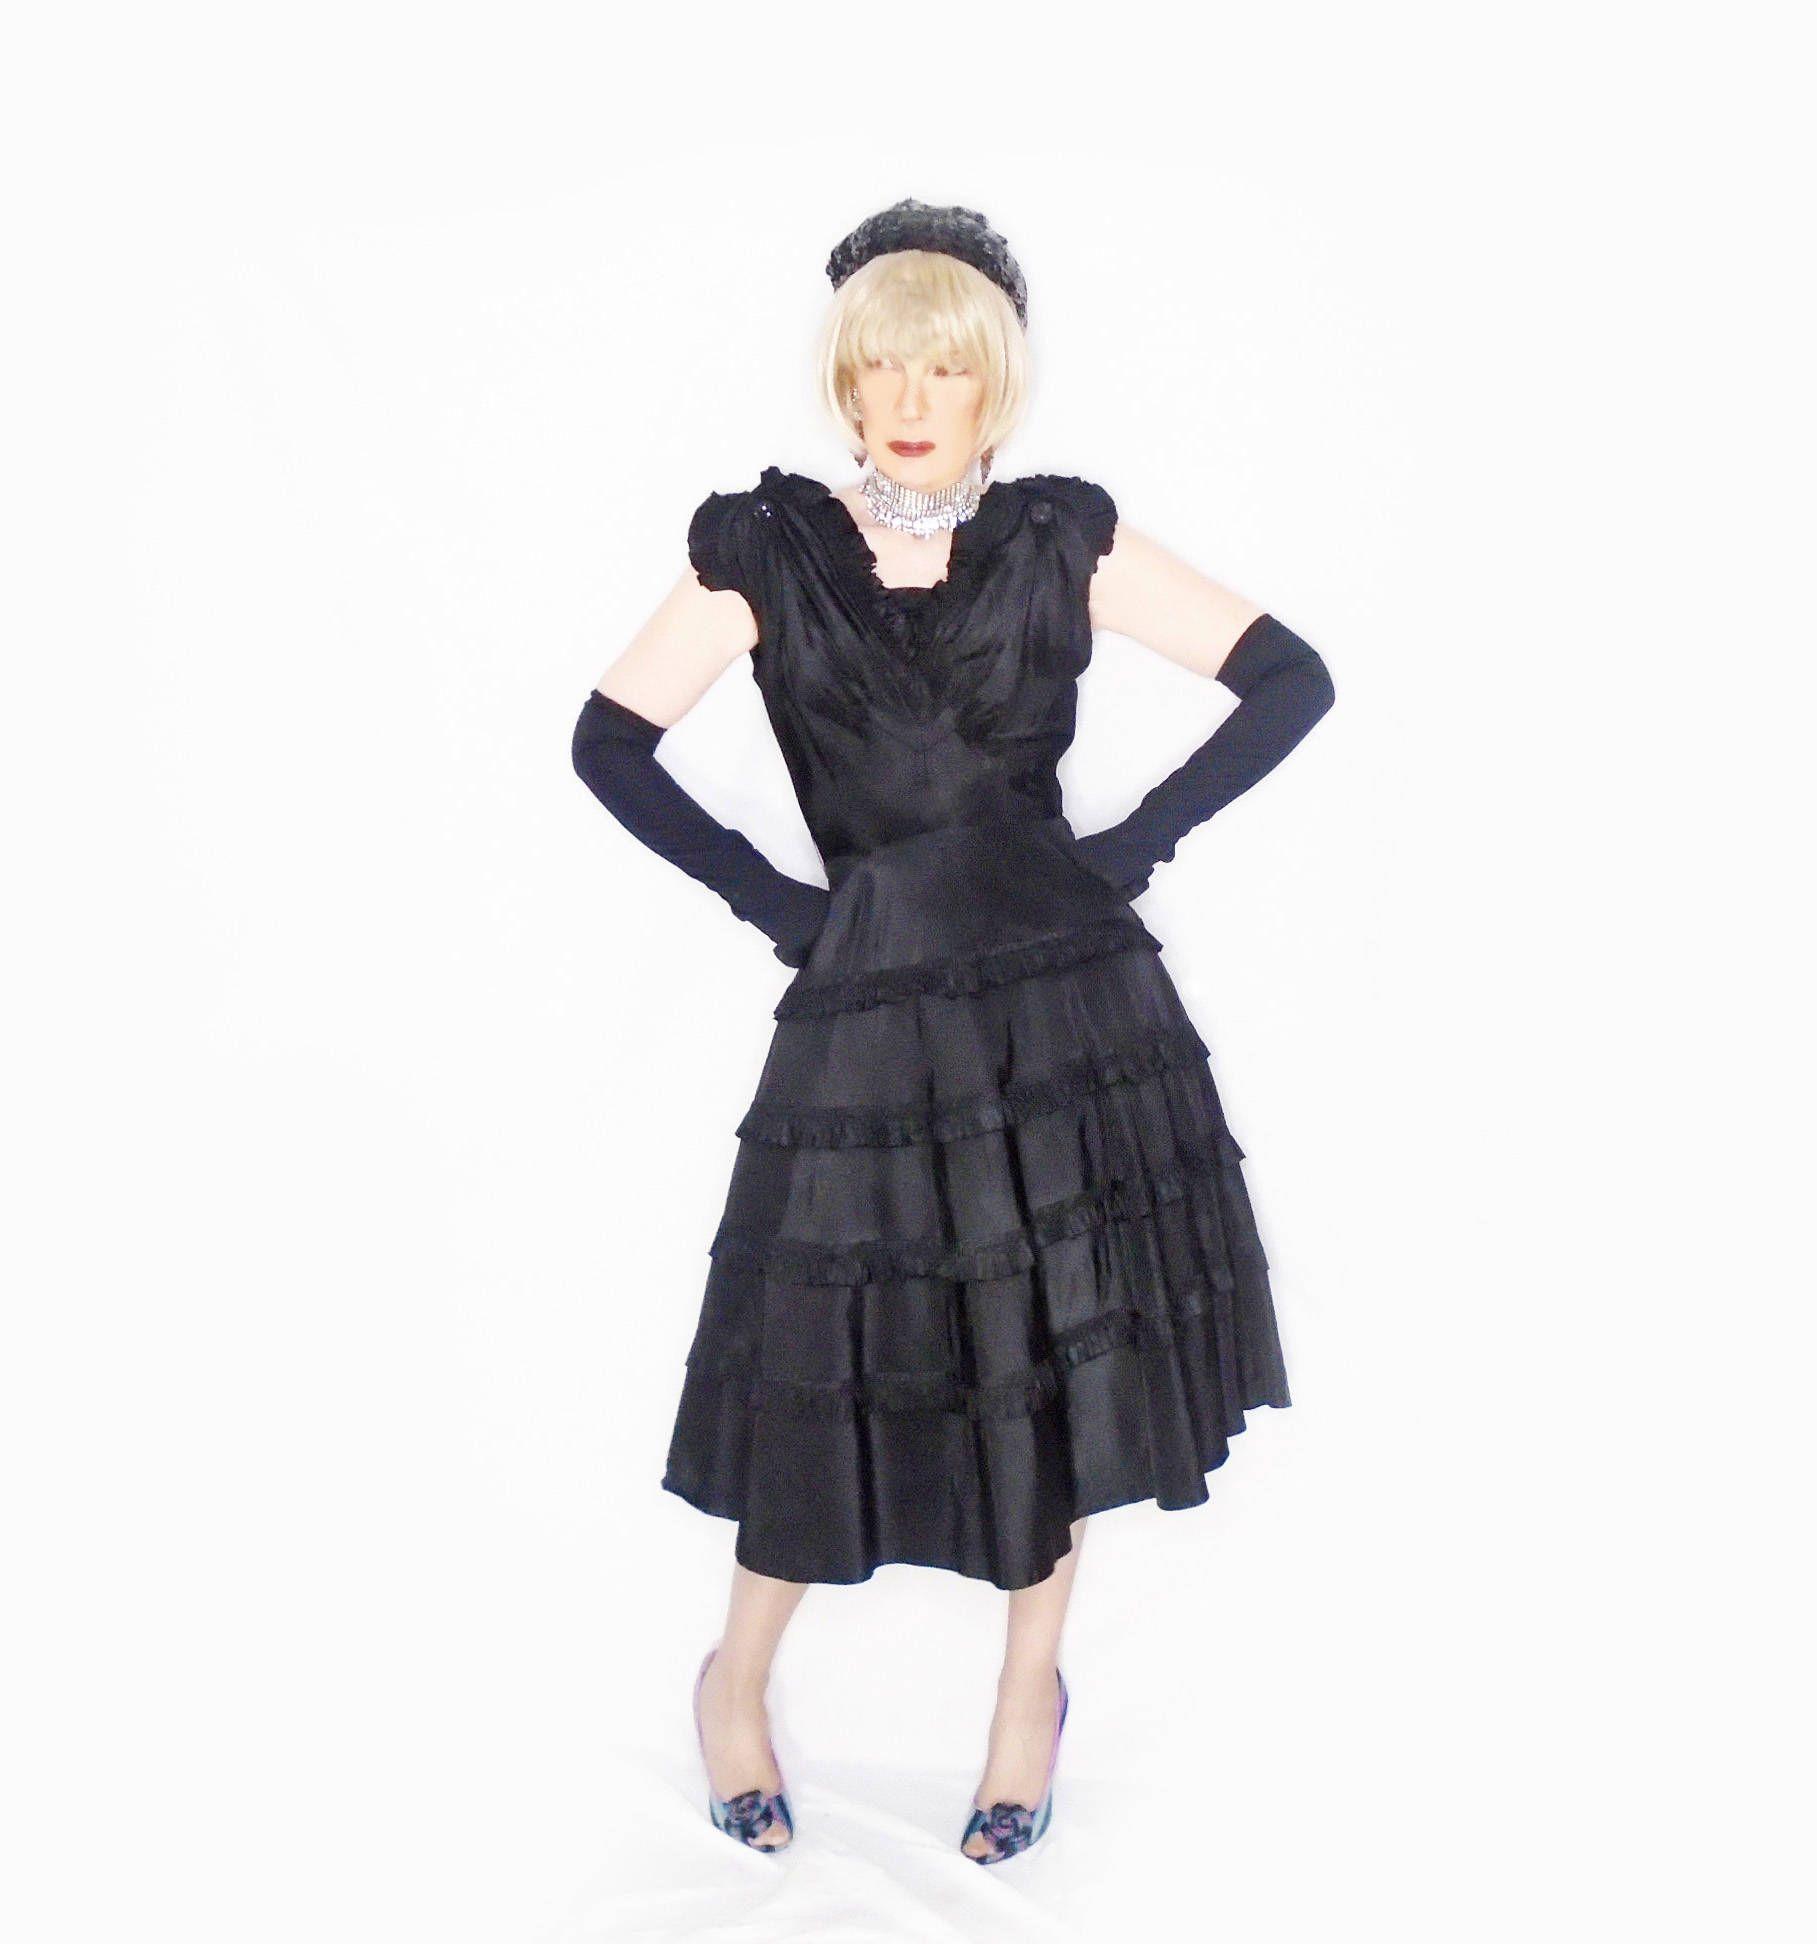 Wedding Guest Dress for Women, Black Cocktail Dress, 40s Black ...